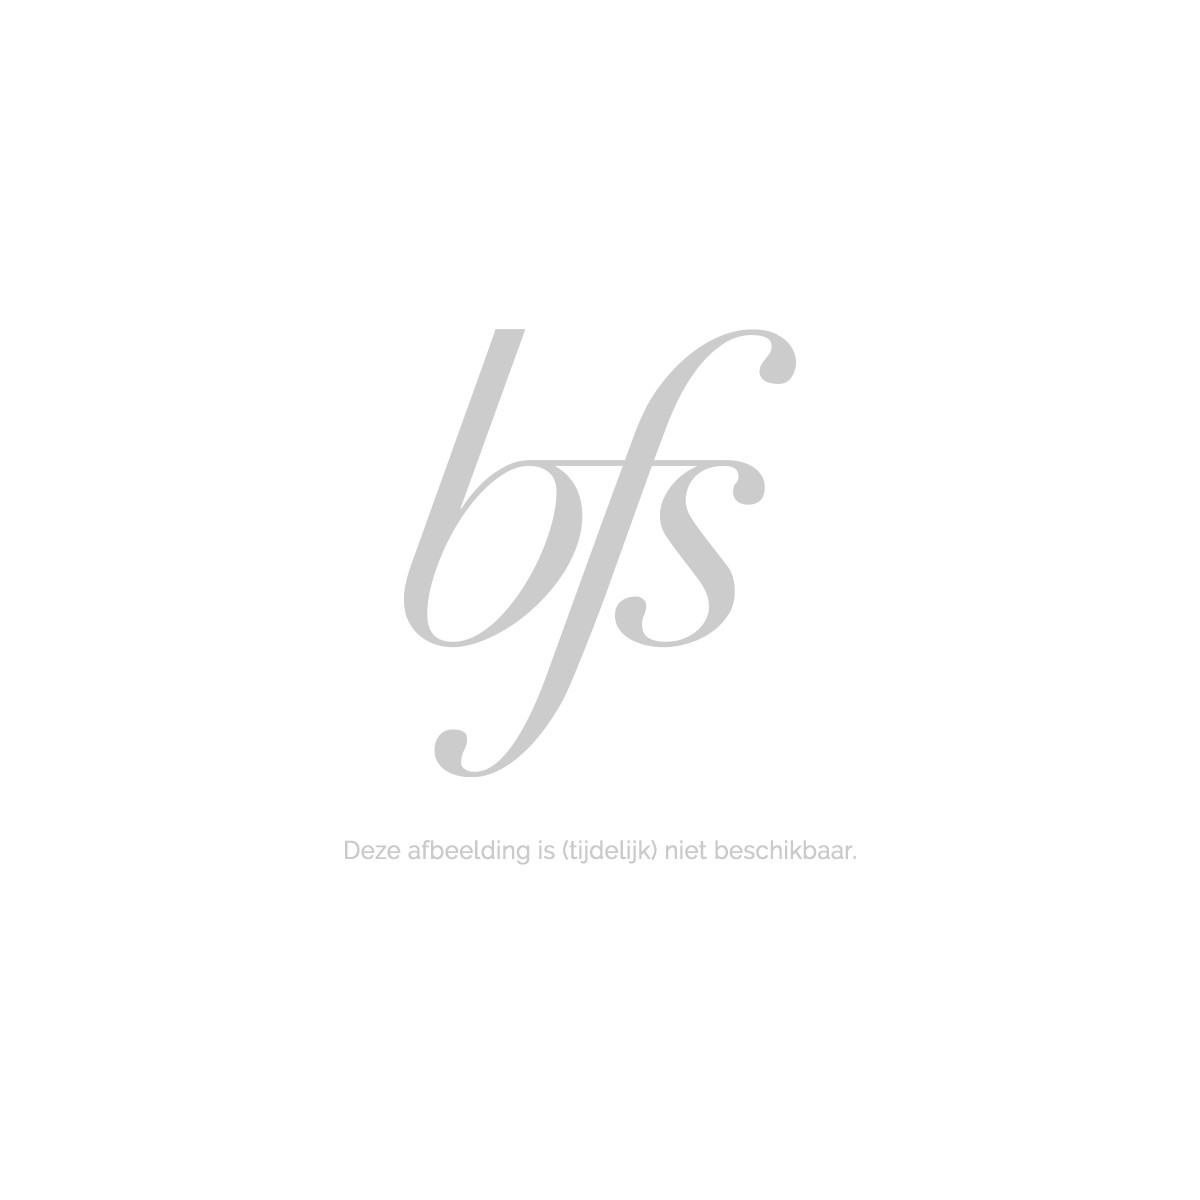 Guerlain Terracotta Bronzing Powder #00 Clair Blondes 10 Gr